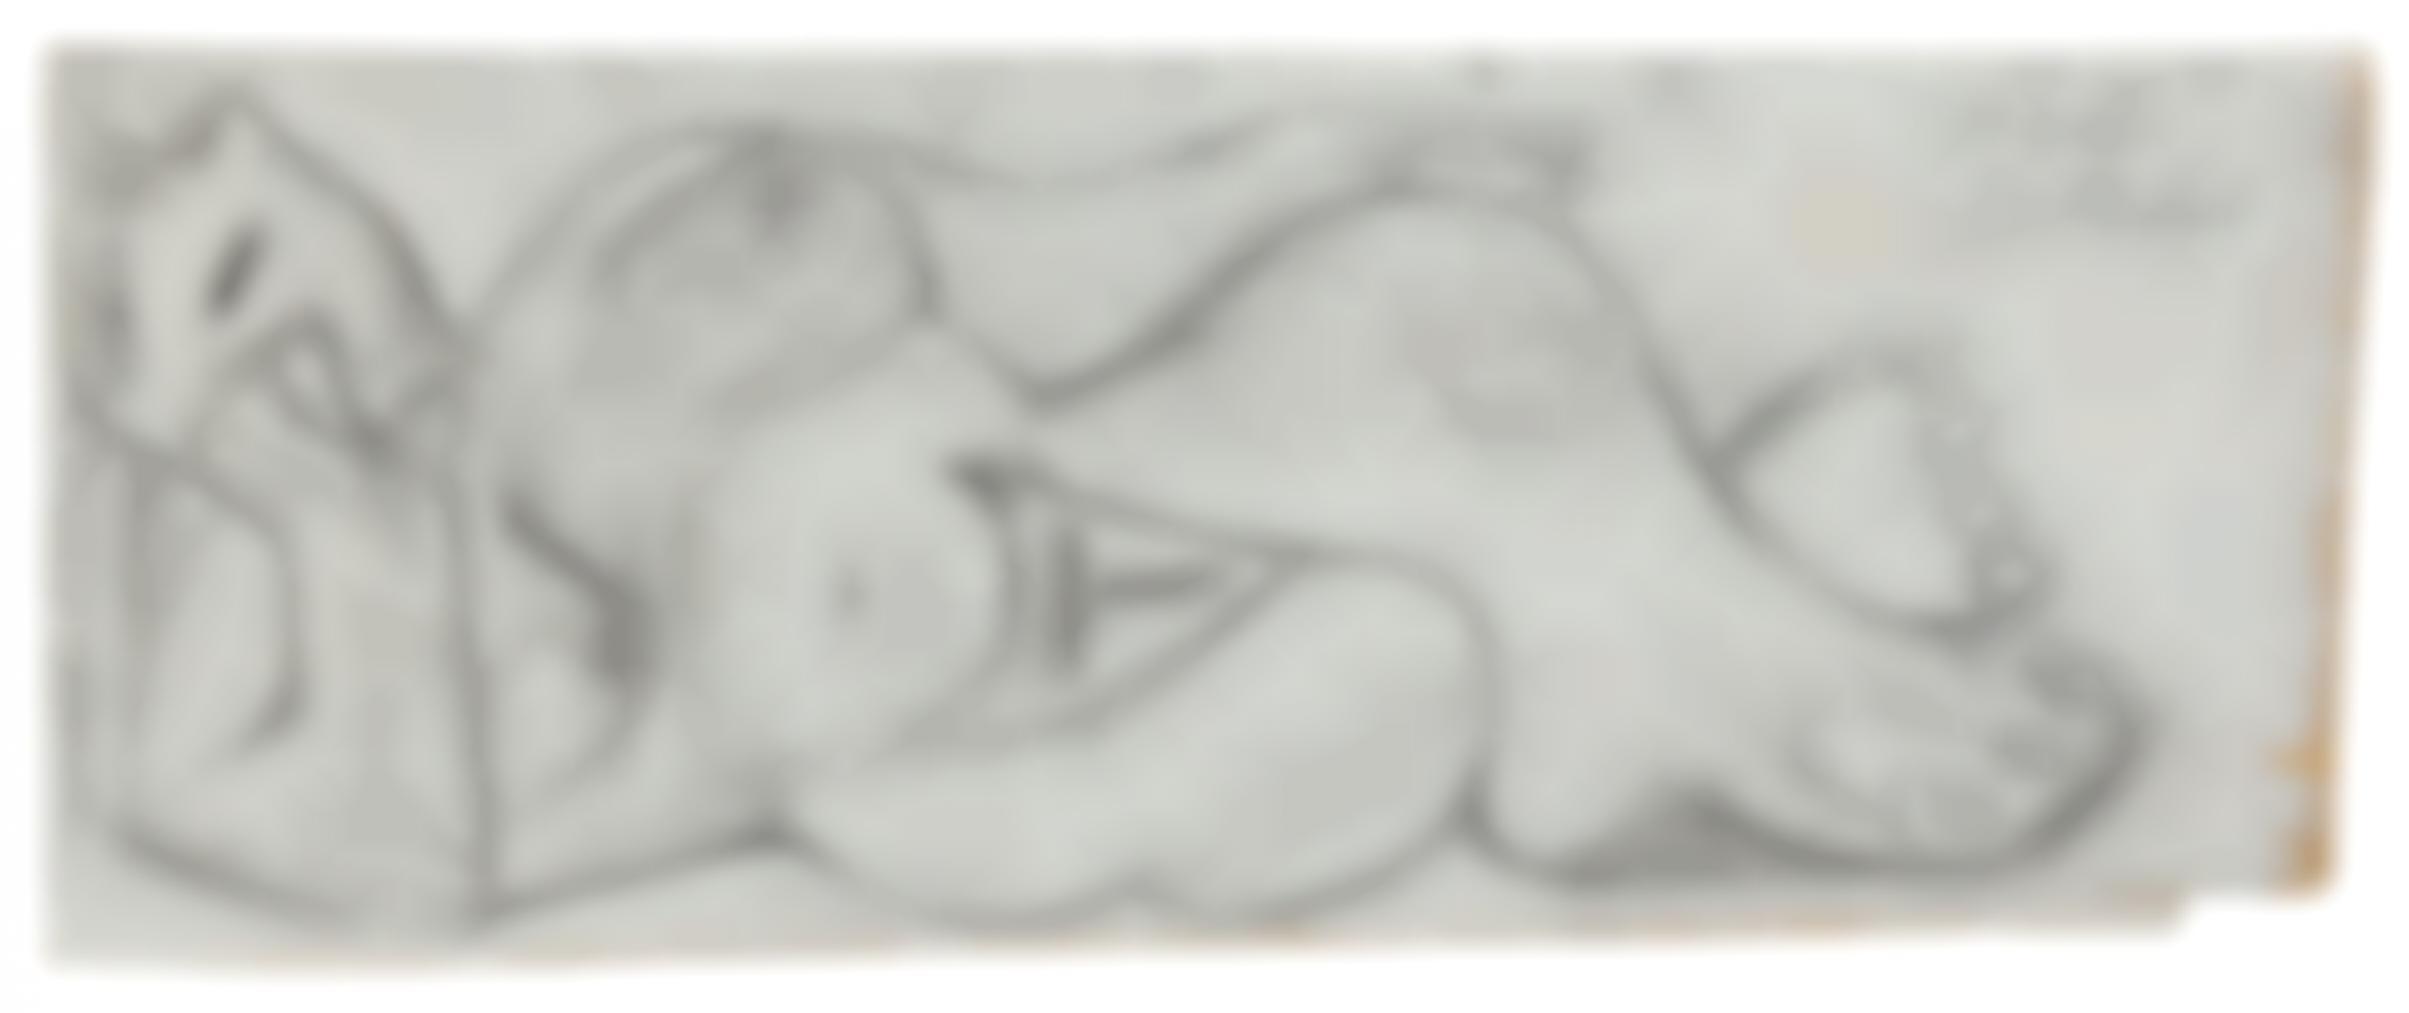 Pablo Picasso-Femme Nue Couchee-1965